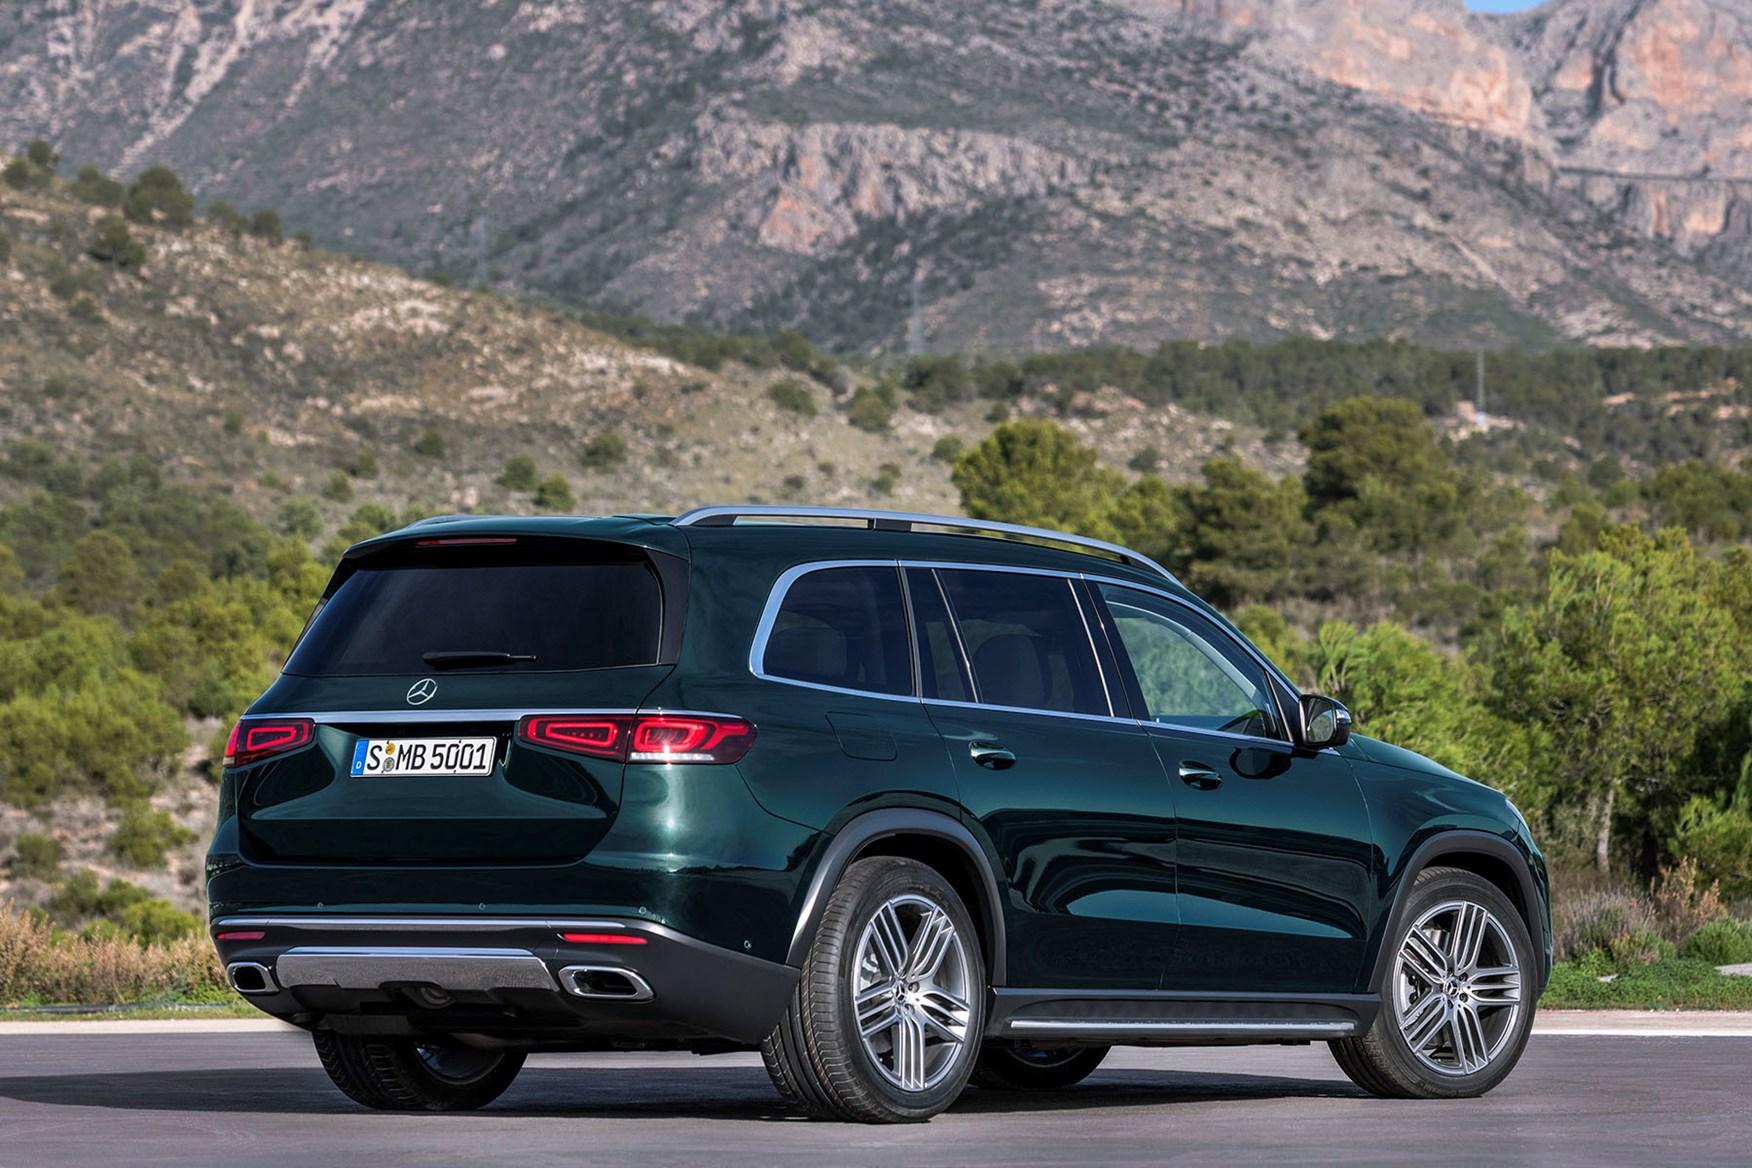 Mercedes-Benz GLS Review (2019) | Parkers